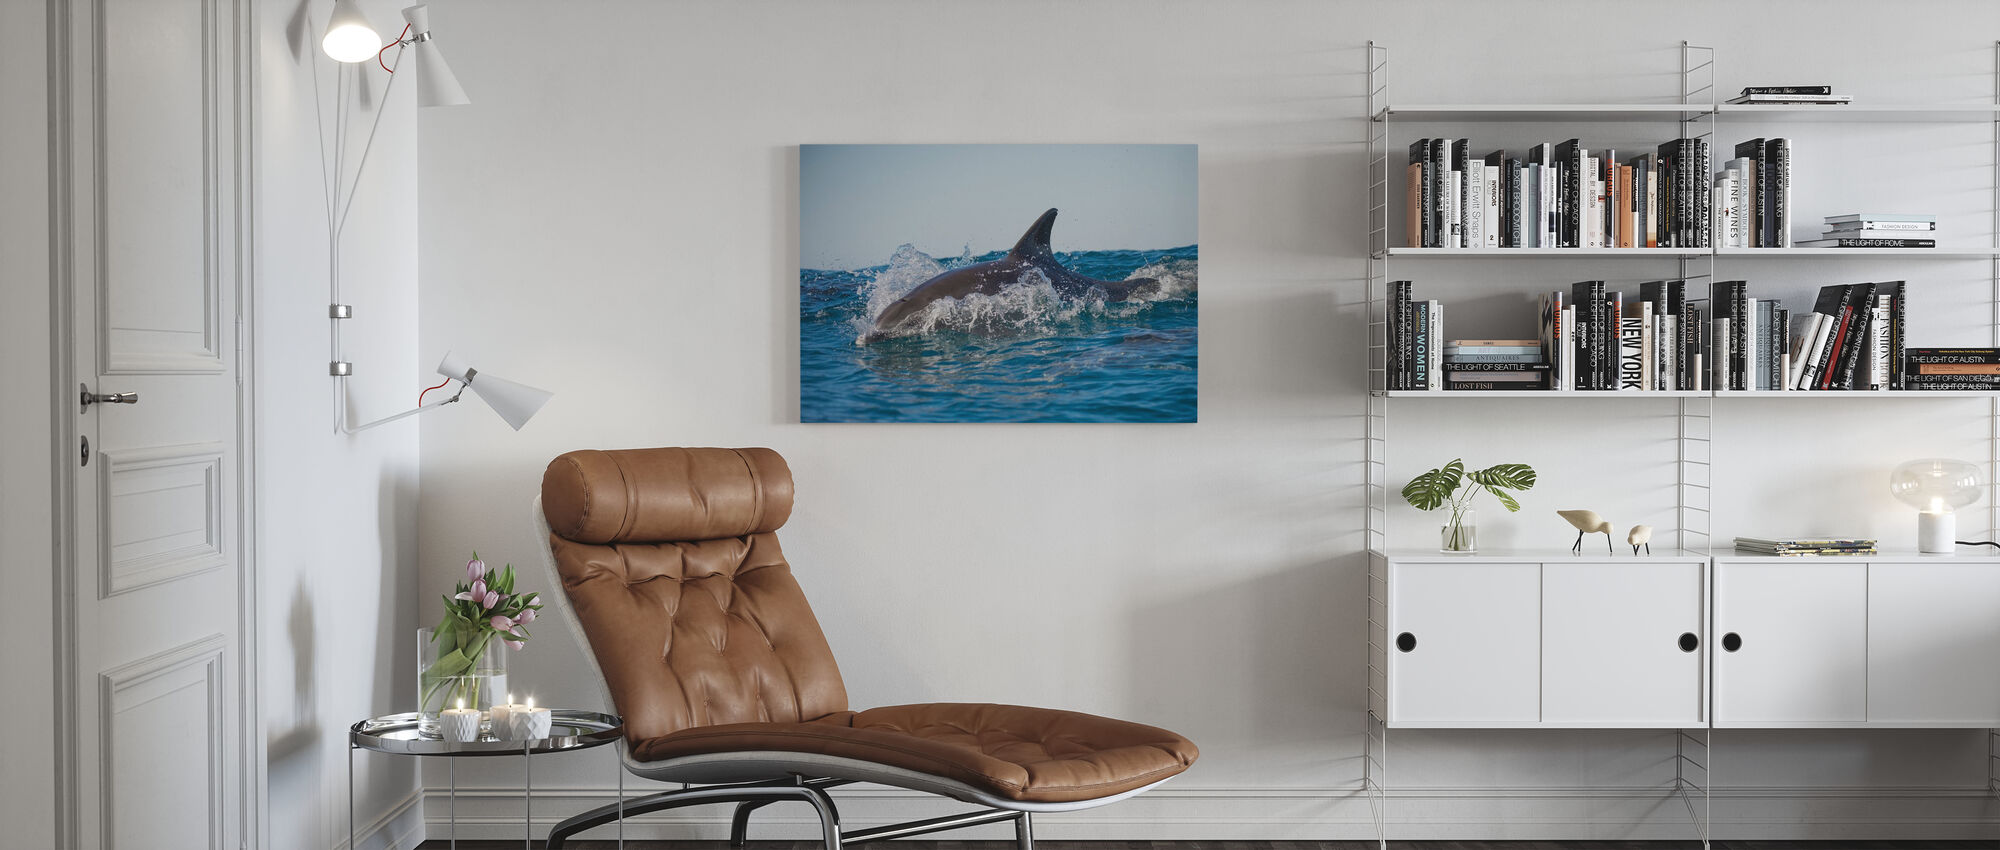 Bottlenose delfin - Lerretsbilde - Stue